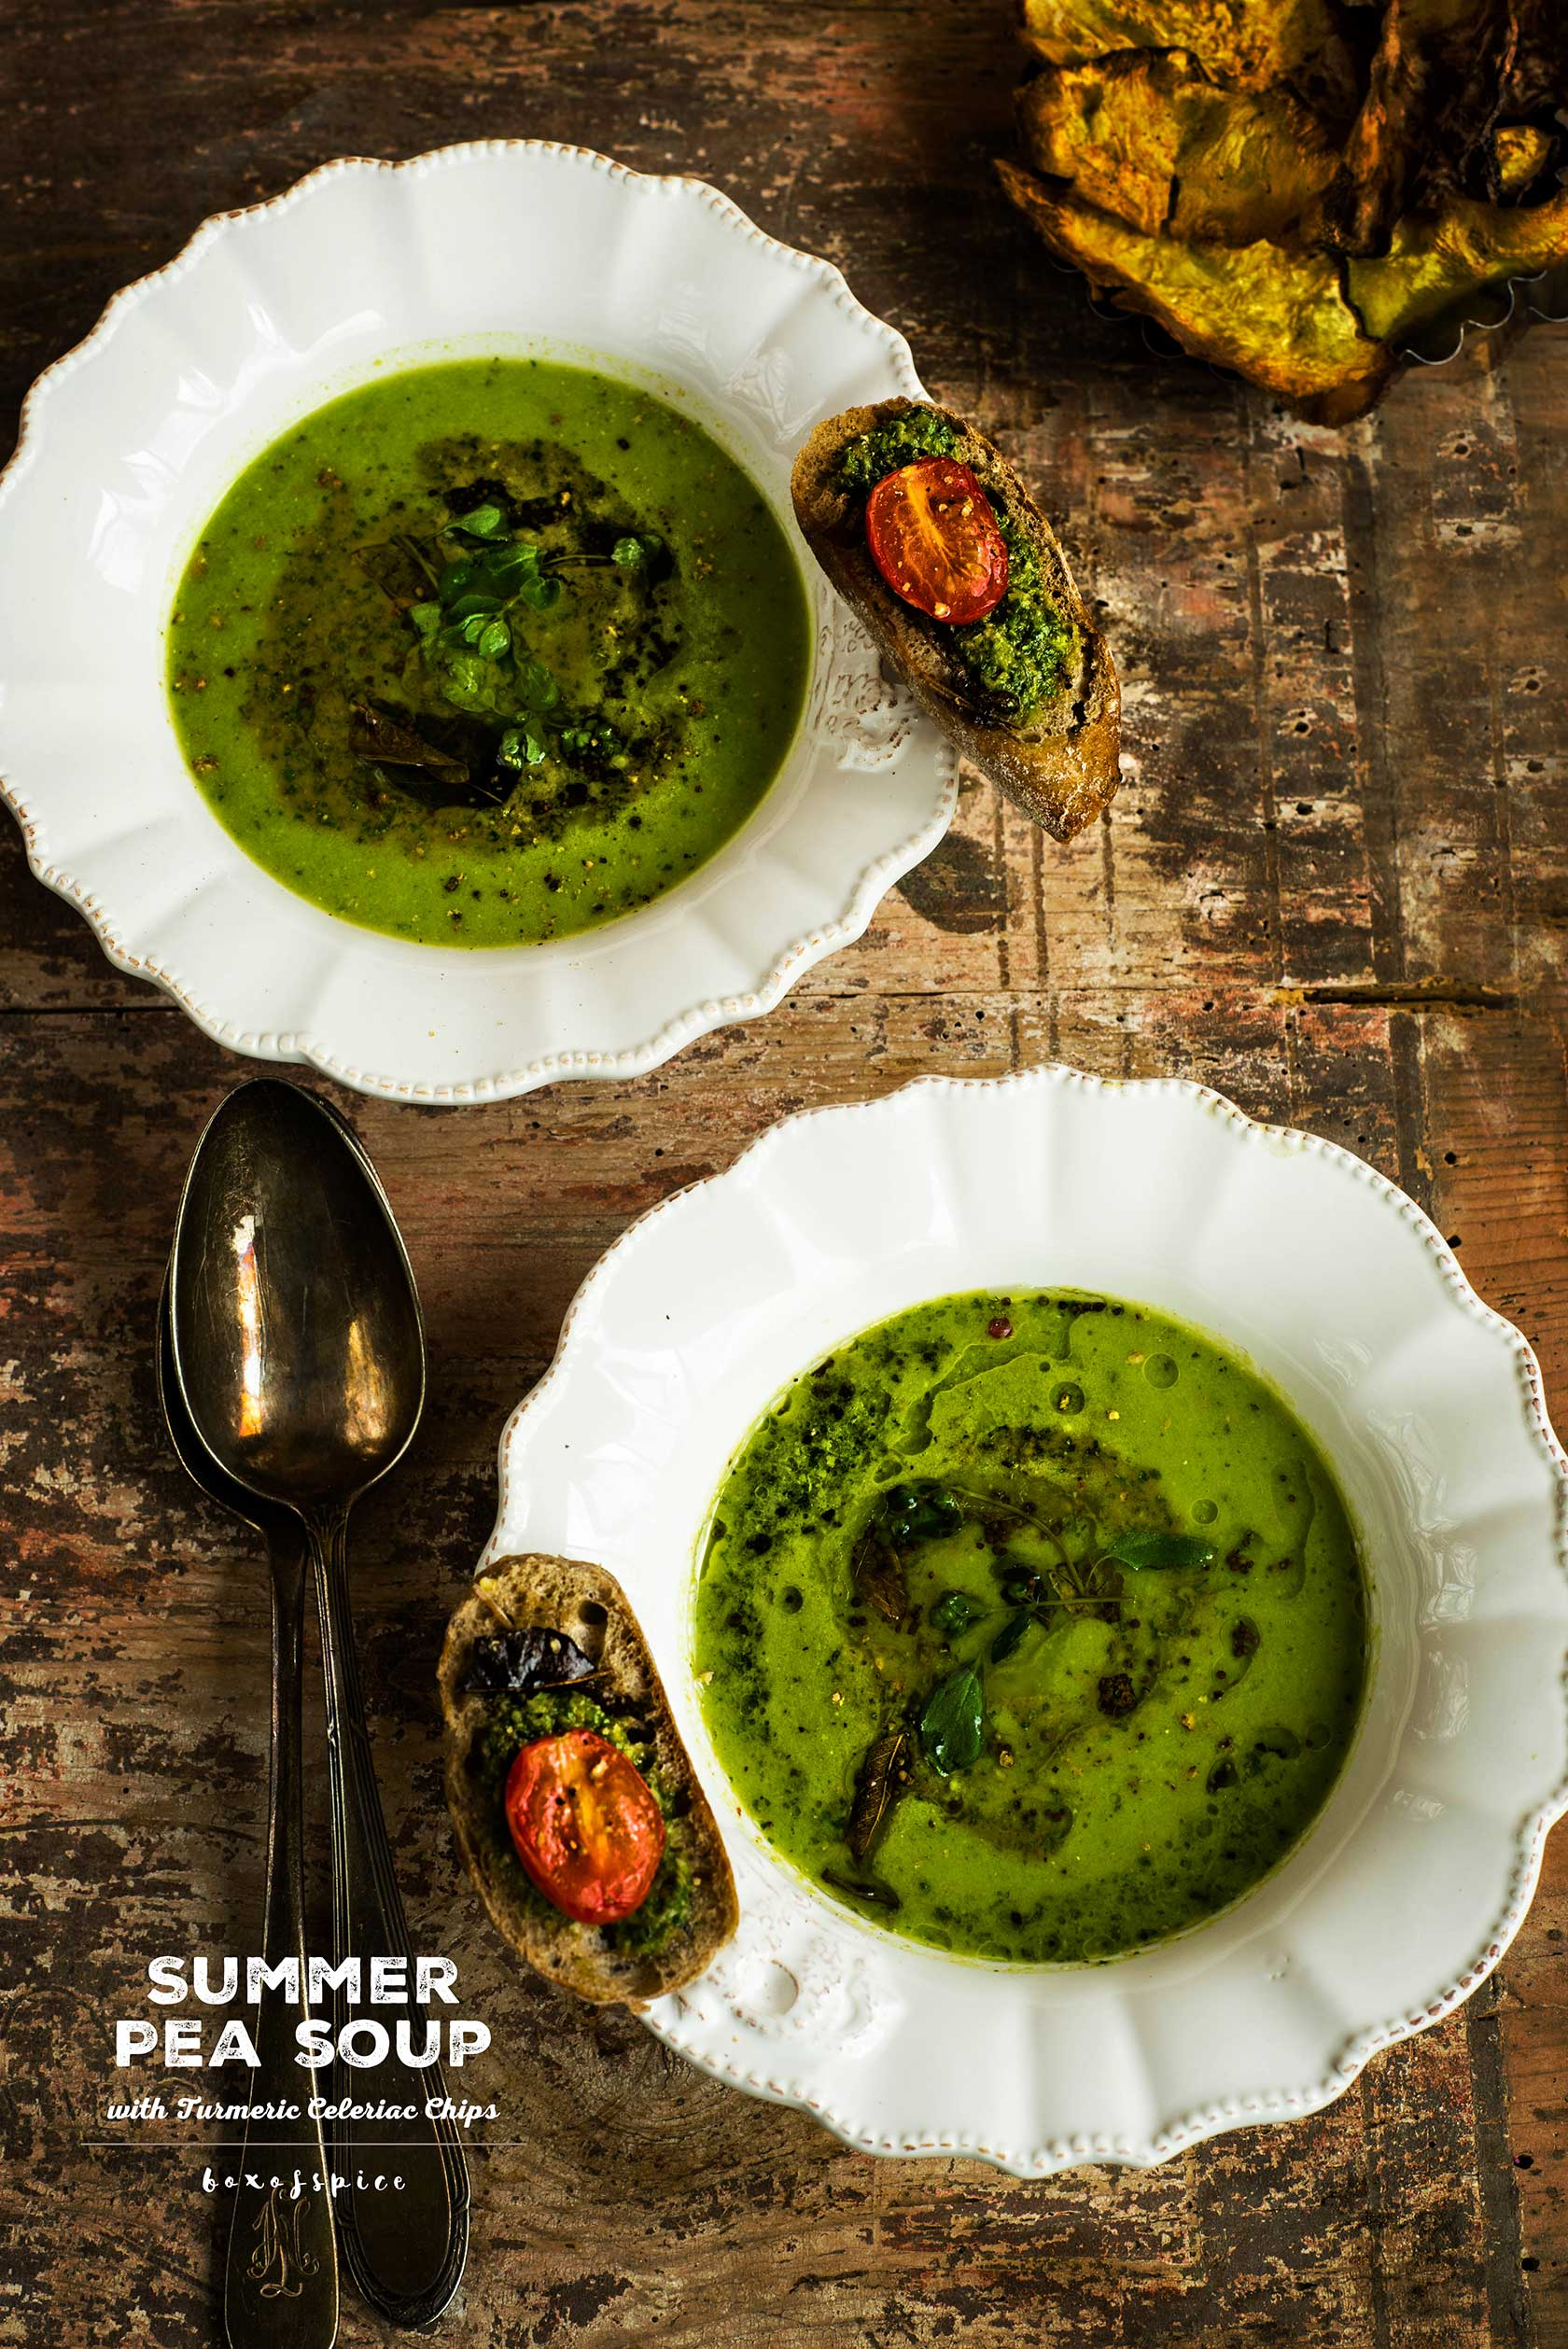 Summer Pea Soup with Turmeric Celeriac Chips I Boxofspice